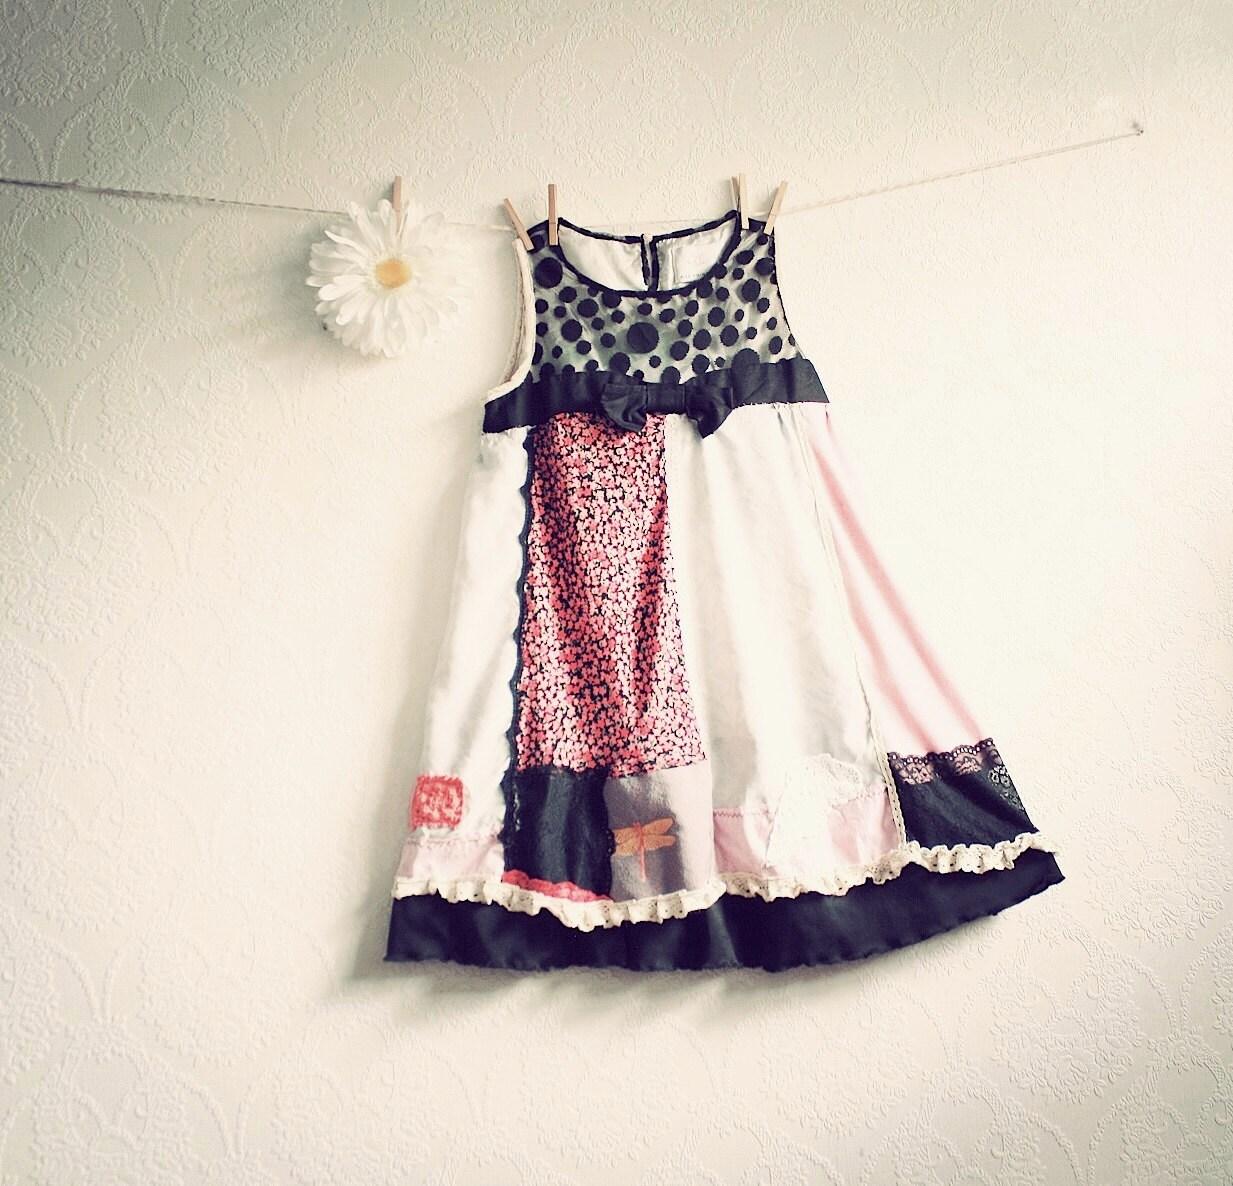 Shabby Chic Babydoll Dress Eco Upcycled Clothing Pink